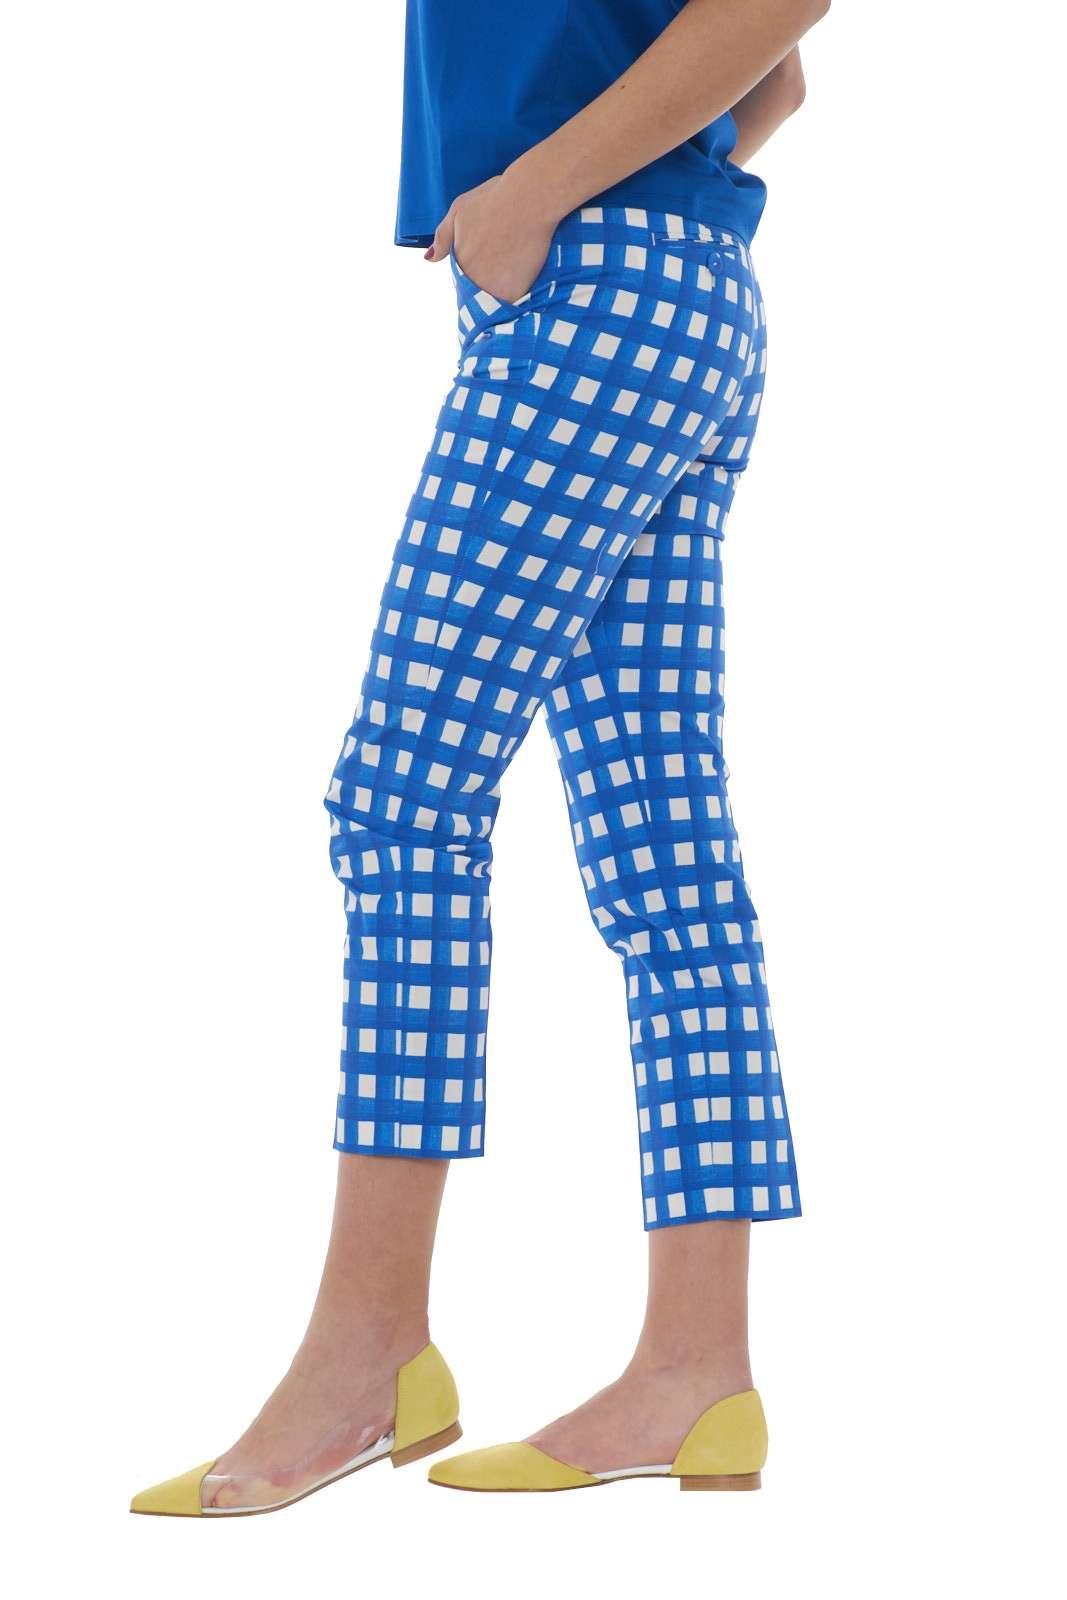 https://www.parmax.com/media/catalog/product/a/i/PE-outlet_parmax-pantalone%20donna-MaxMara-51310401-B.jpg